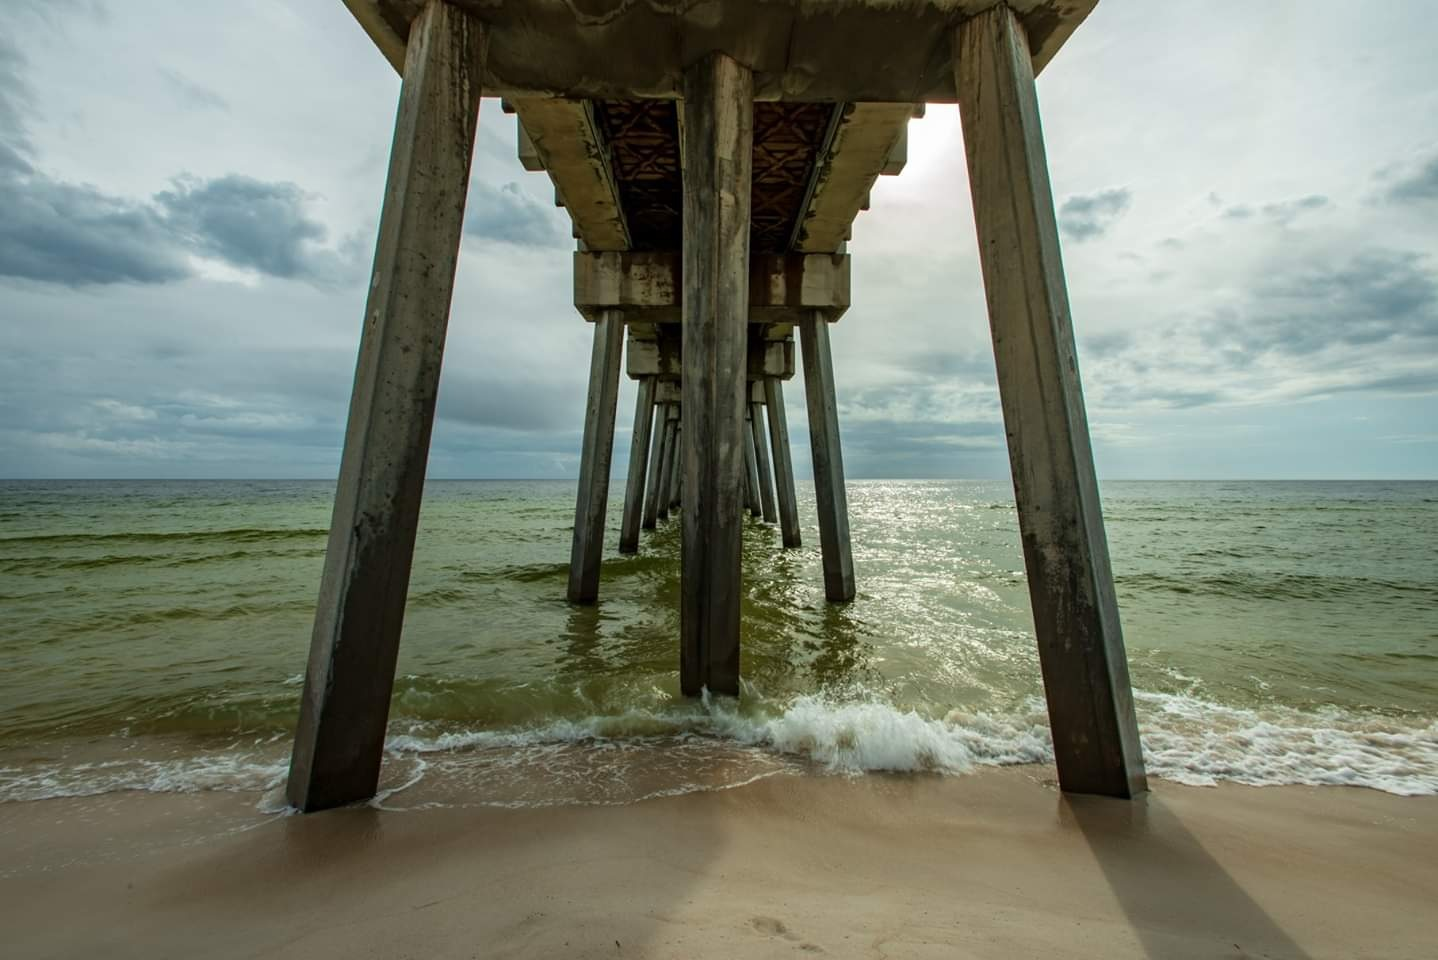 Untitled by Jason Hatch/1111Photography